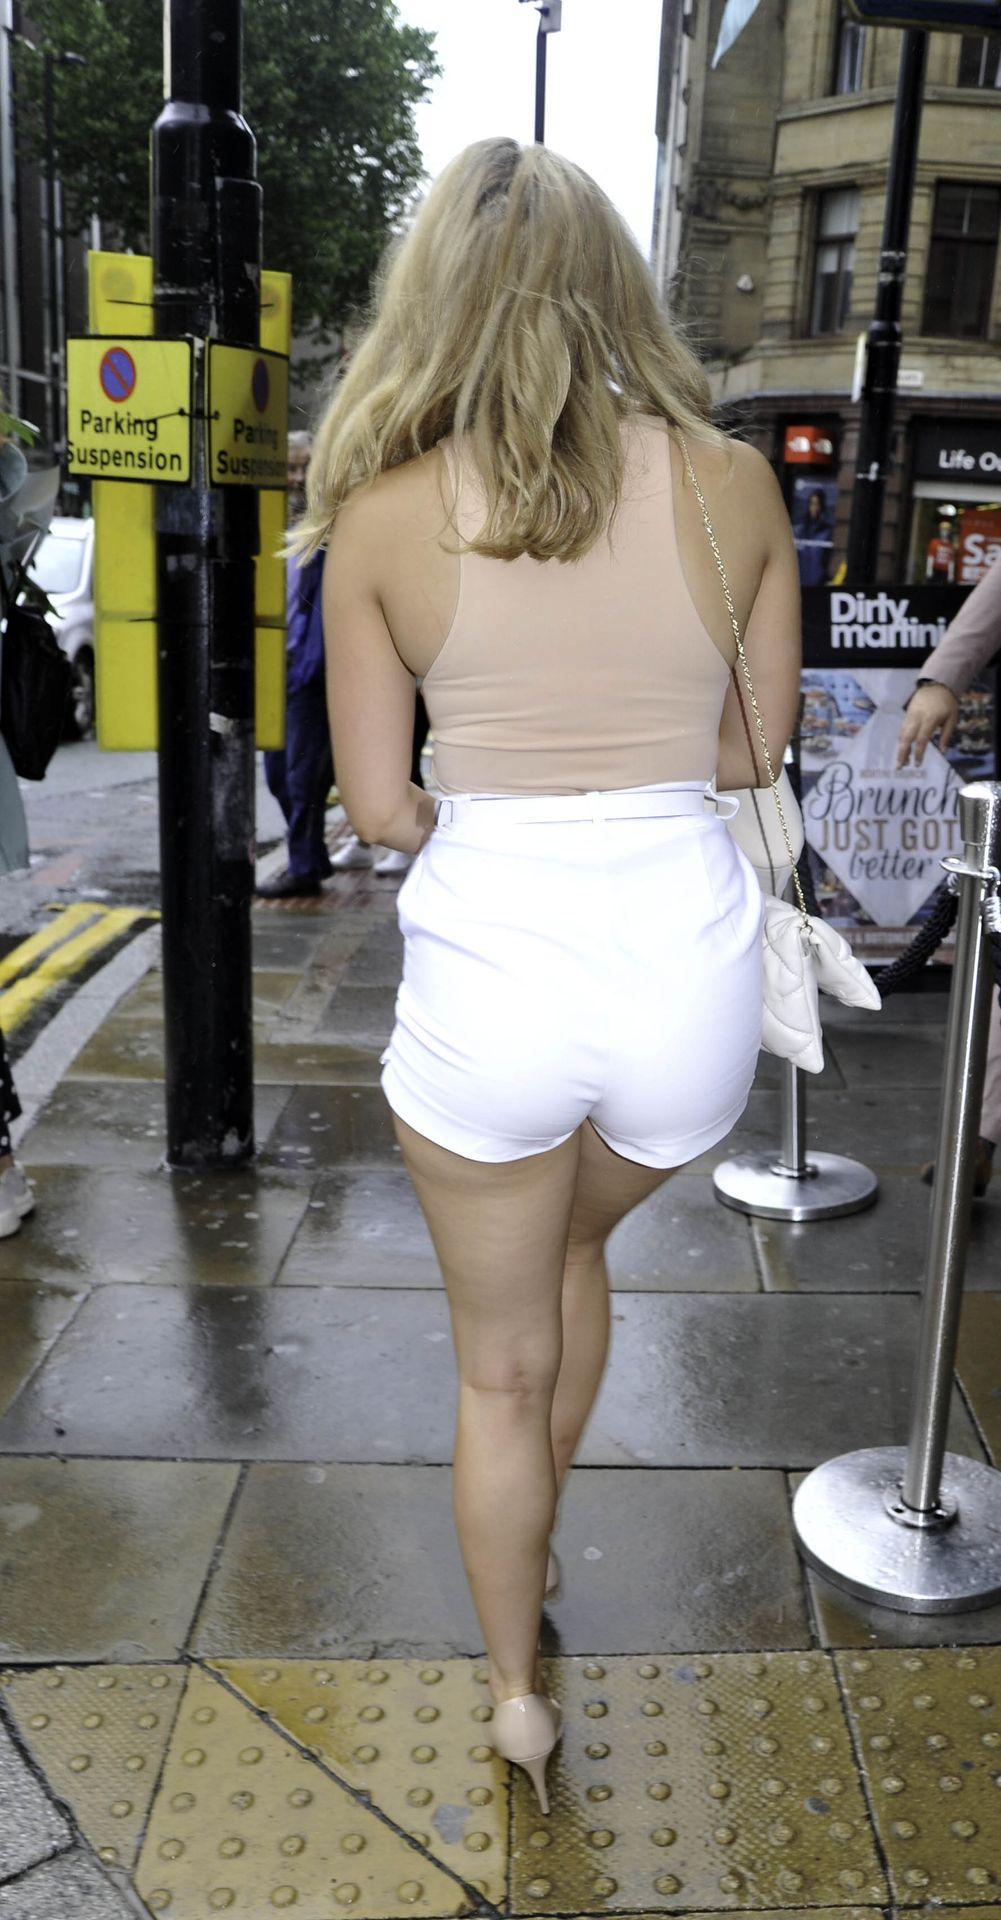 Leggy Mollie Winnard Enjoys a Day Out At Dirty Martini Bar (15 Photos)